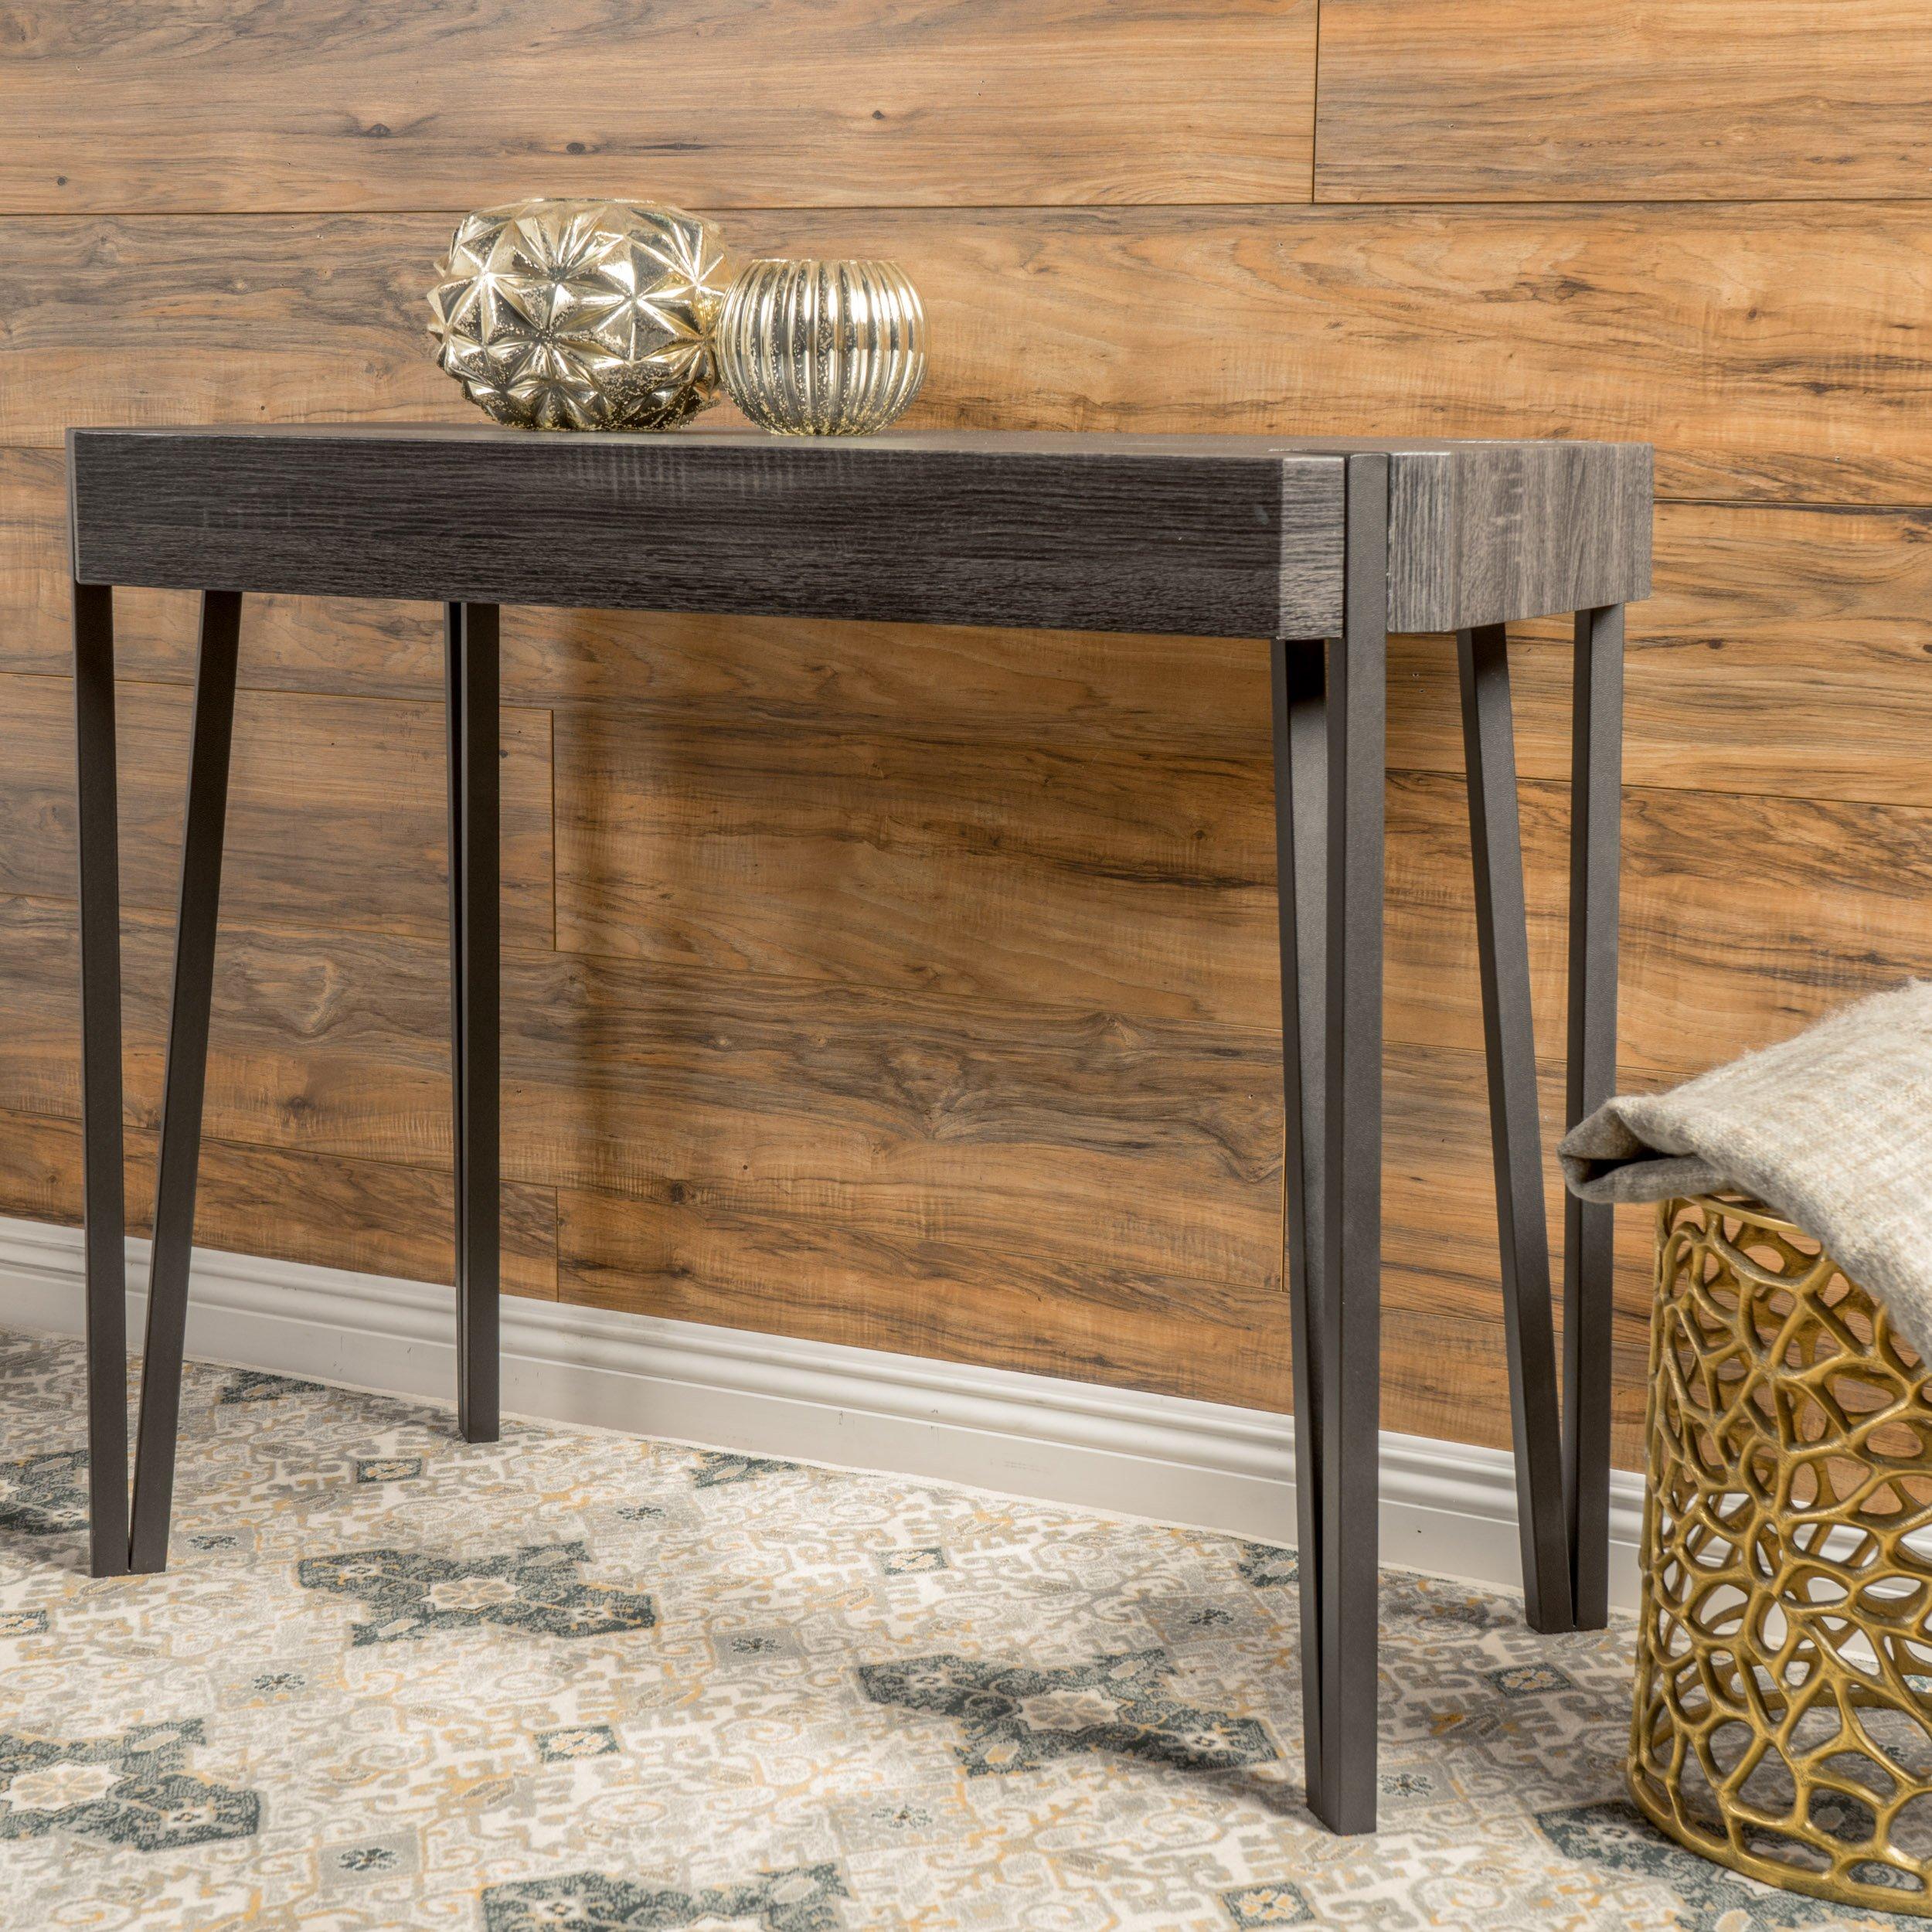 Christopher Knight Home 298288 Vidar Laminated Wood Console Table, Black by Christopher Knight Home